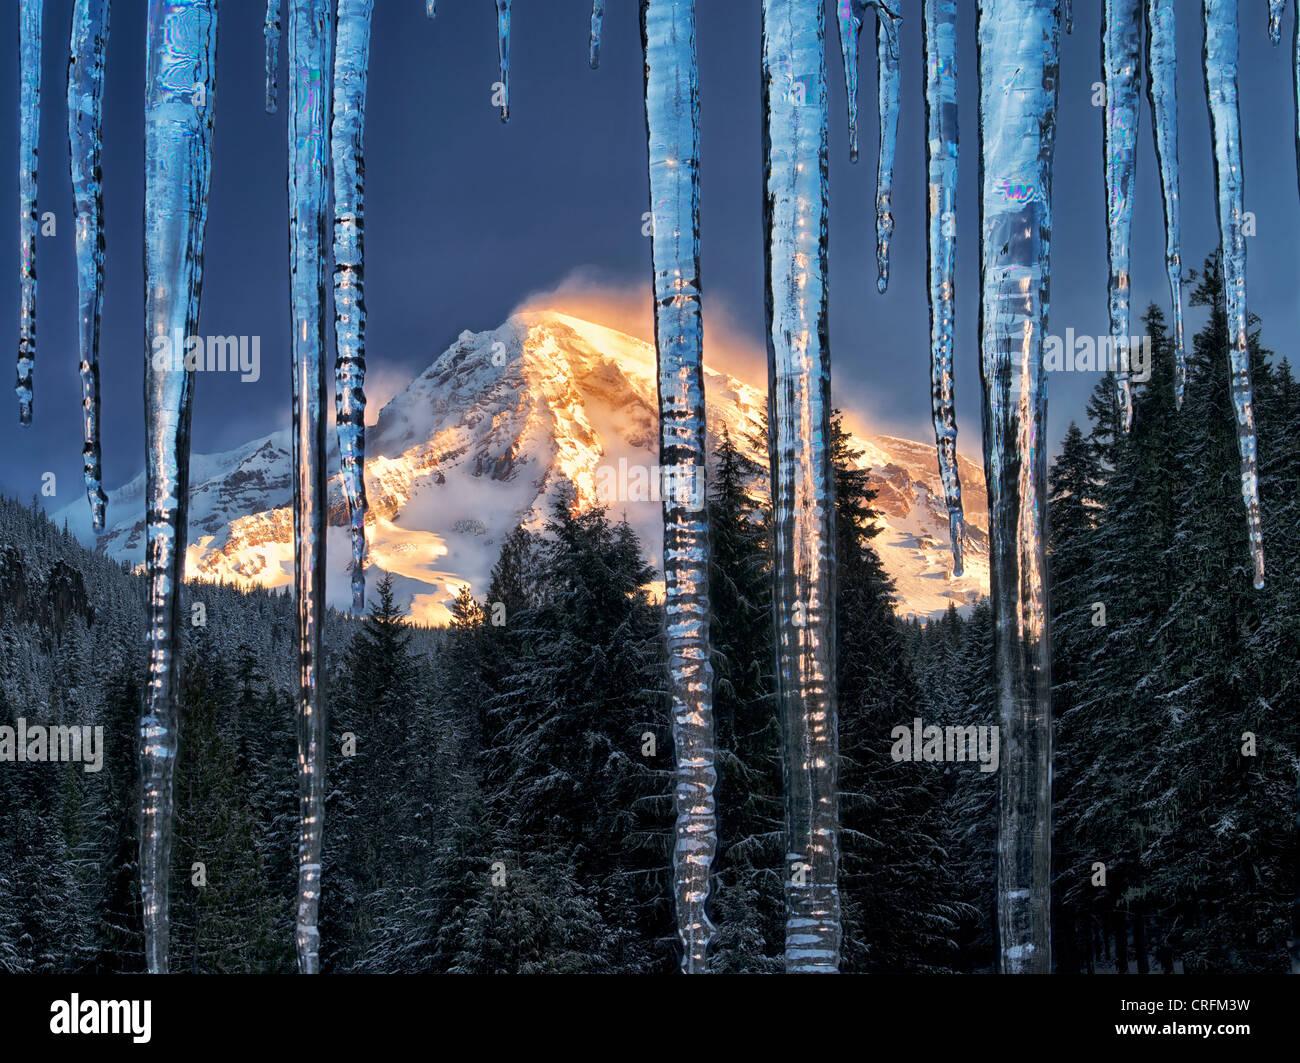 Icicles and Mt. Rainier. Mt. Rainier National Park, Washington - Stock Image